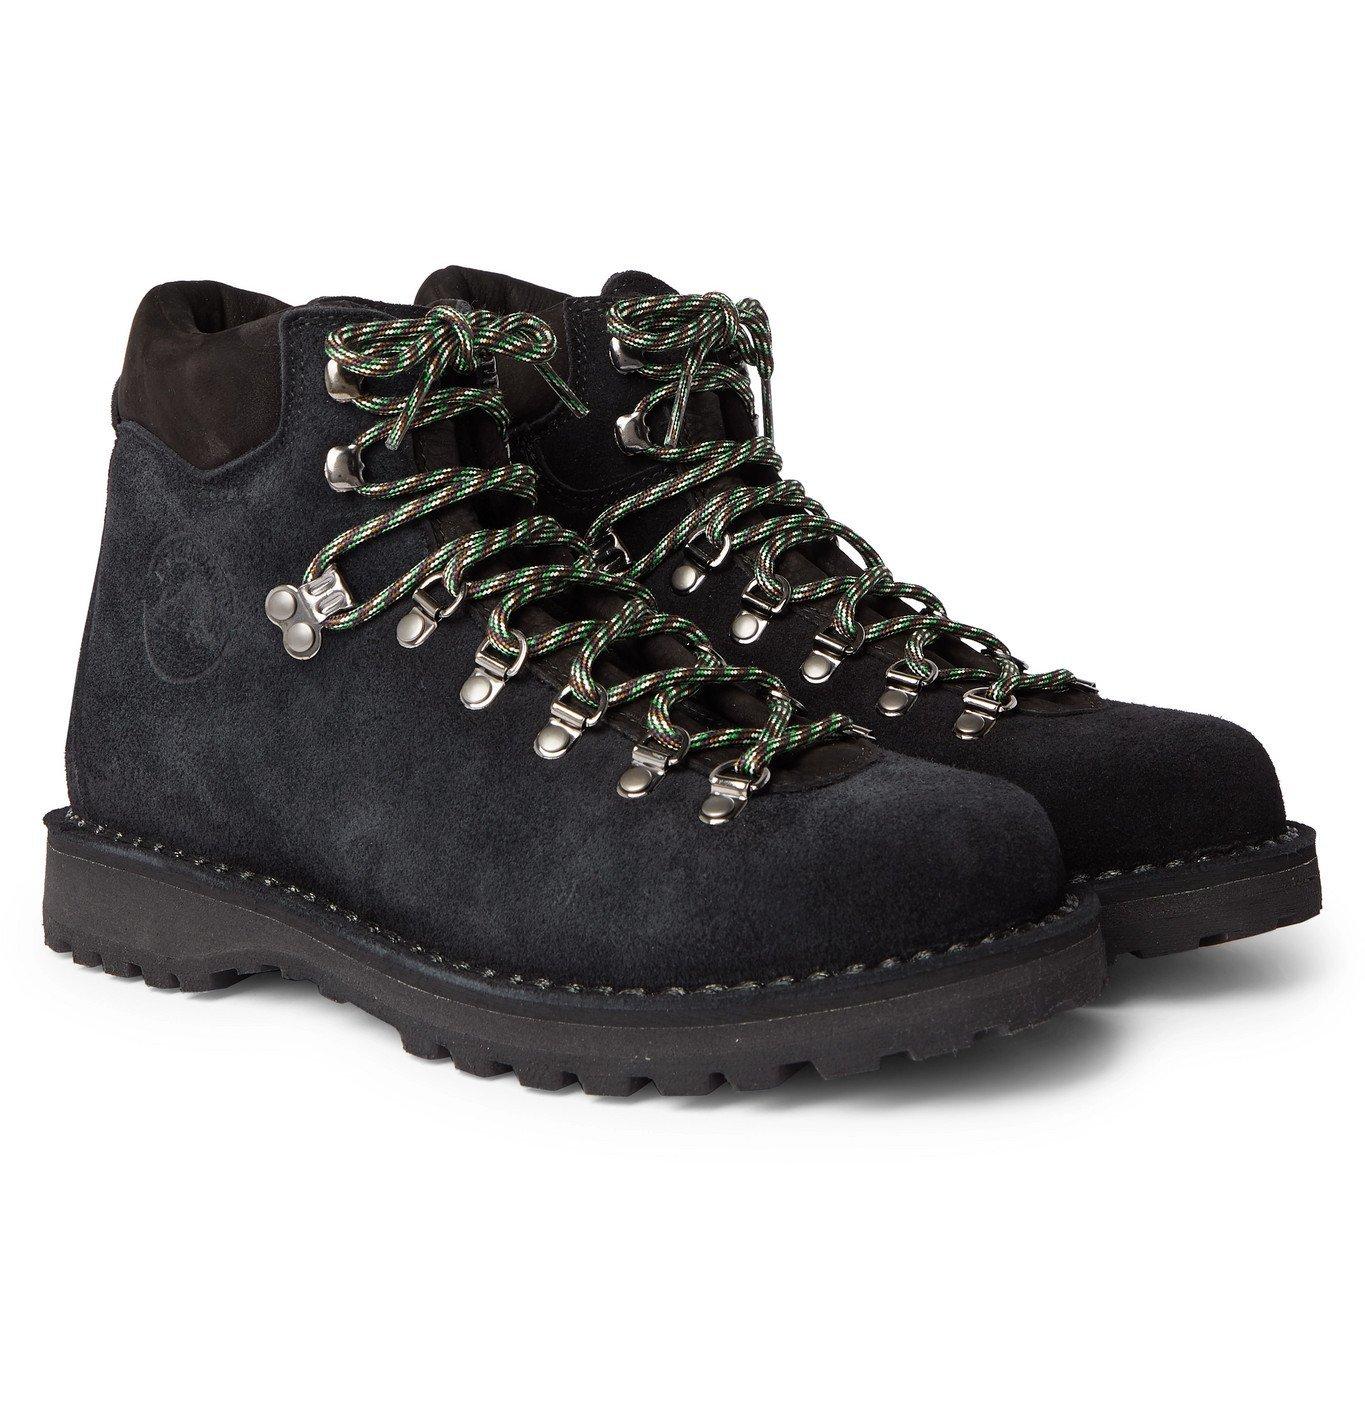 Photo: Diemme - Roccia Vet Leather-Trimmed Suede Hiking Boots - Black